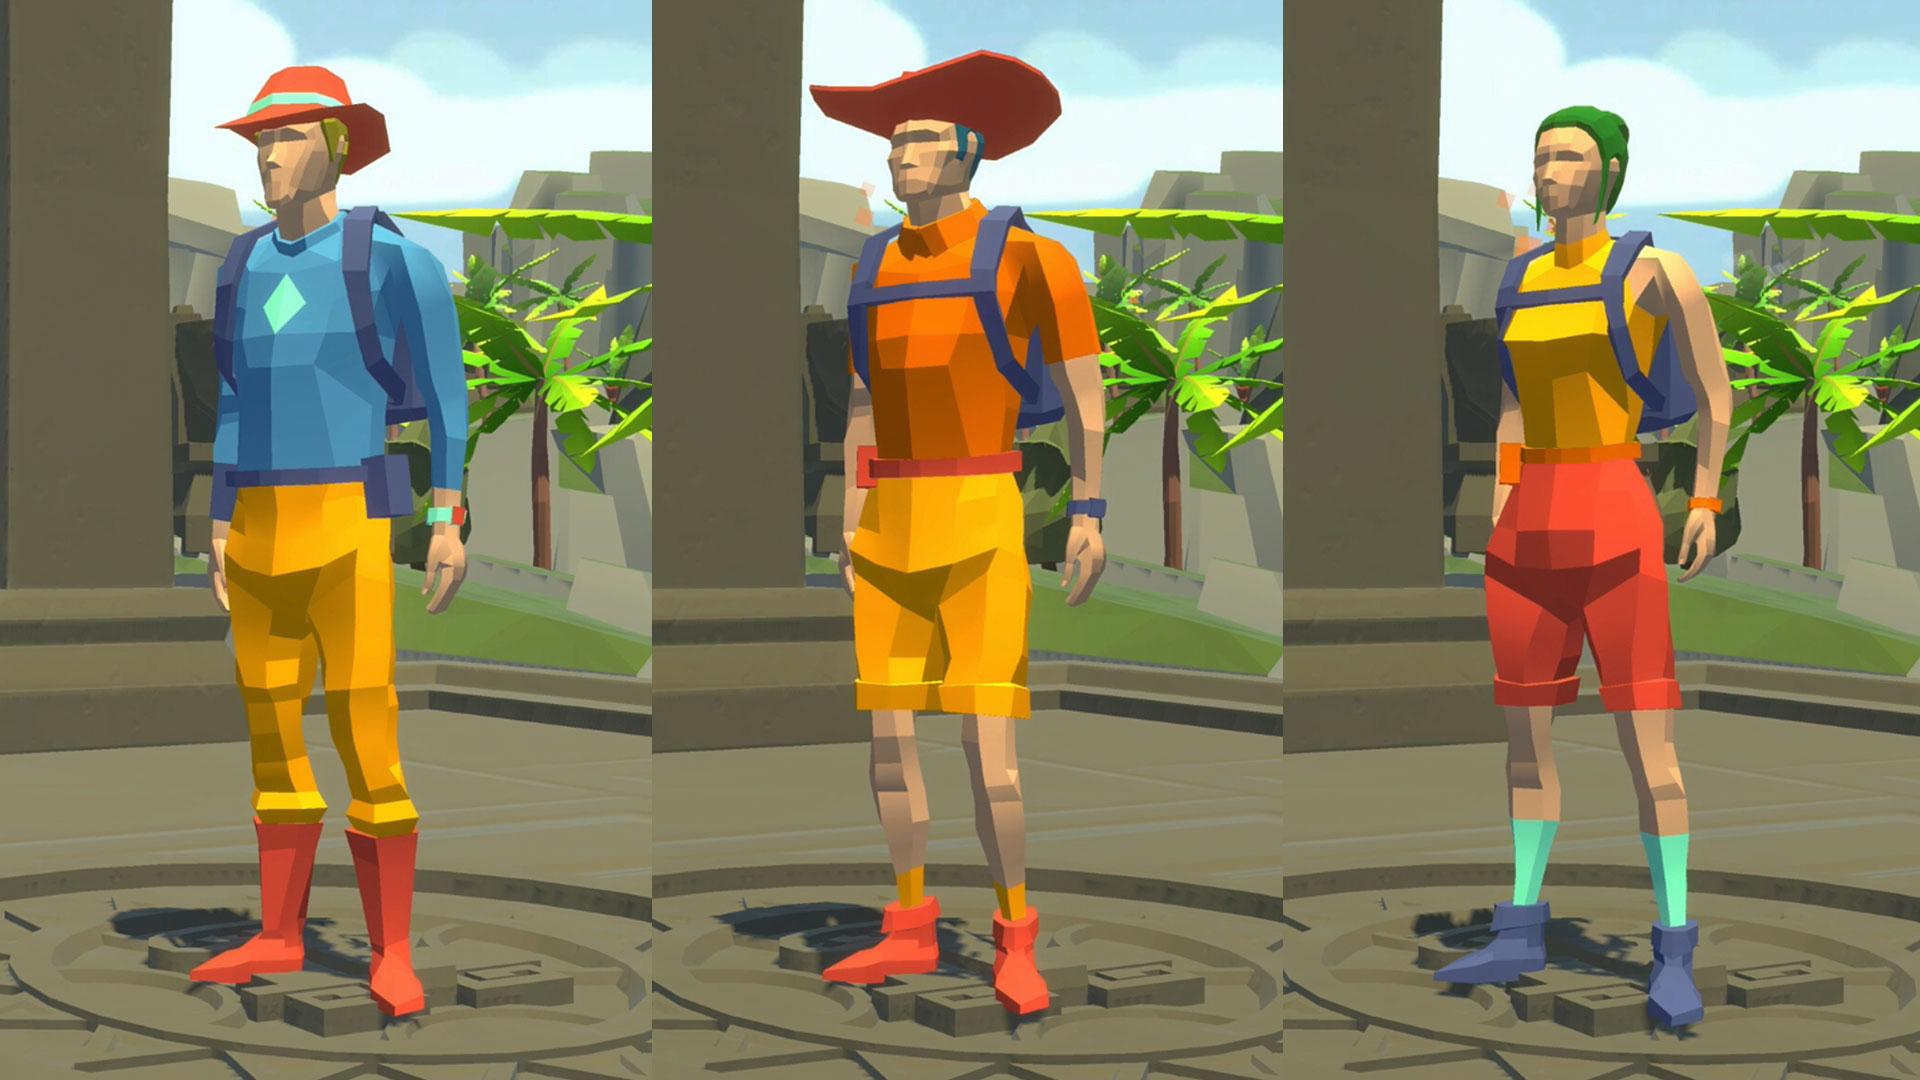 customized avatars